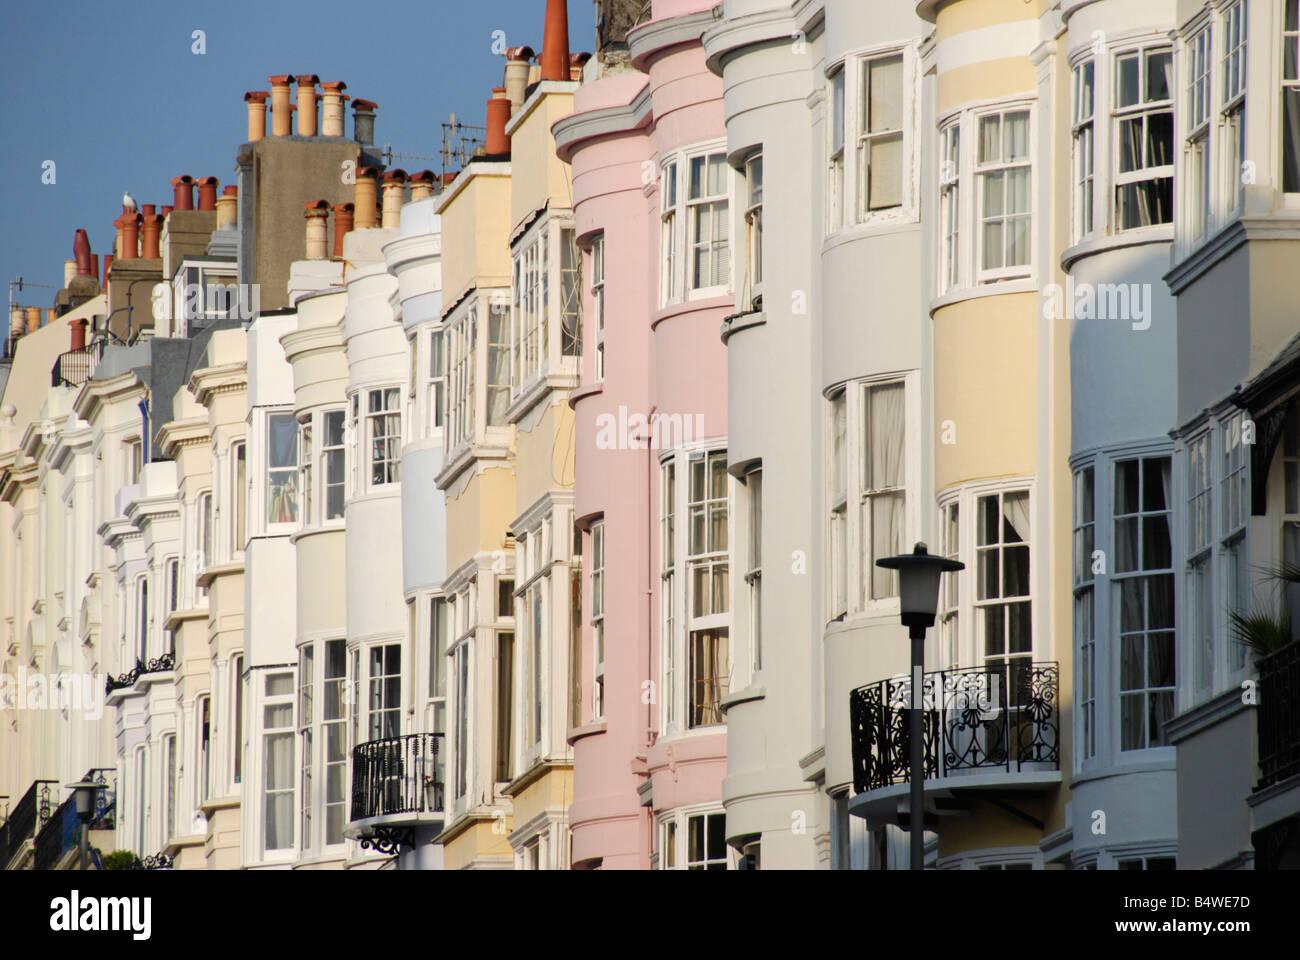 Colourful terraced houses stock photos colourful for Brighton house